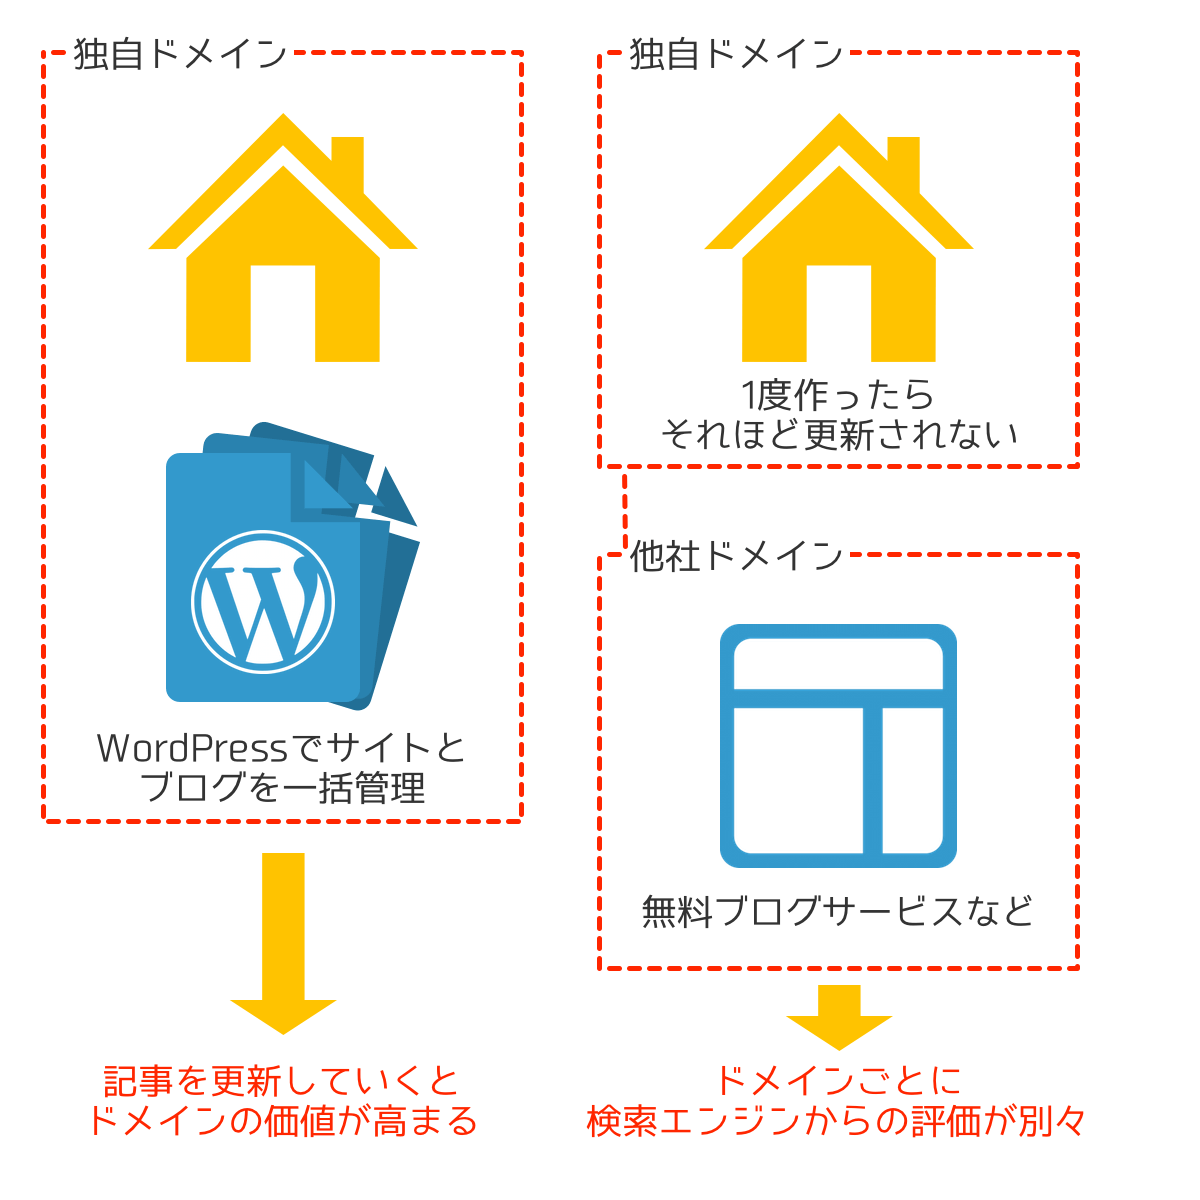 WordPressでサイトとブログを運営するメリット